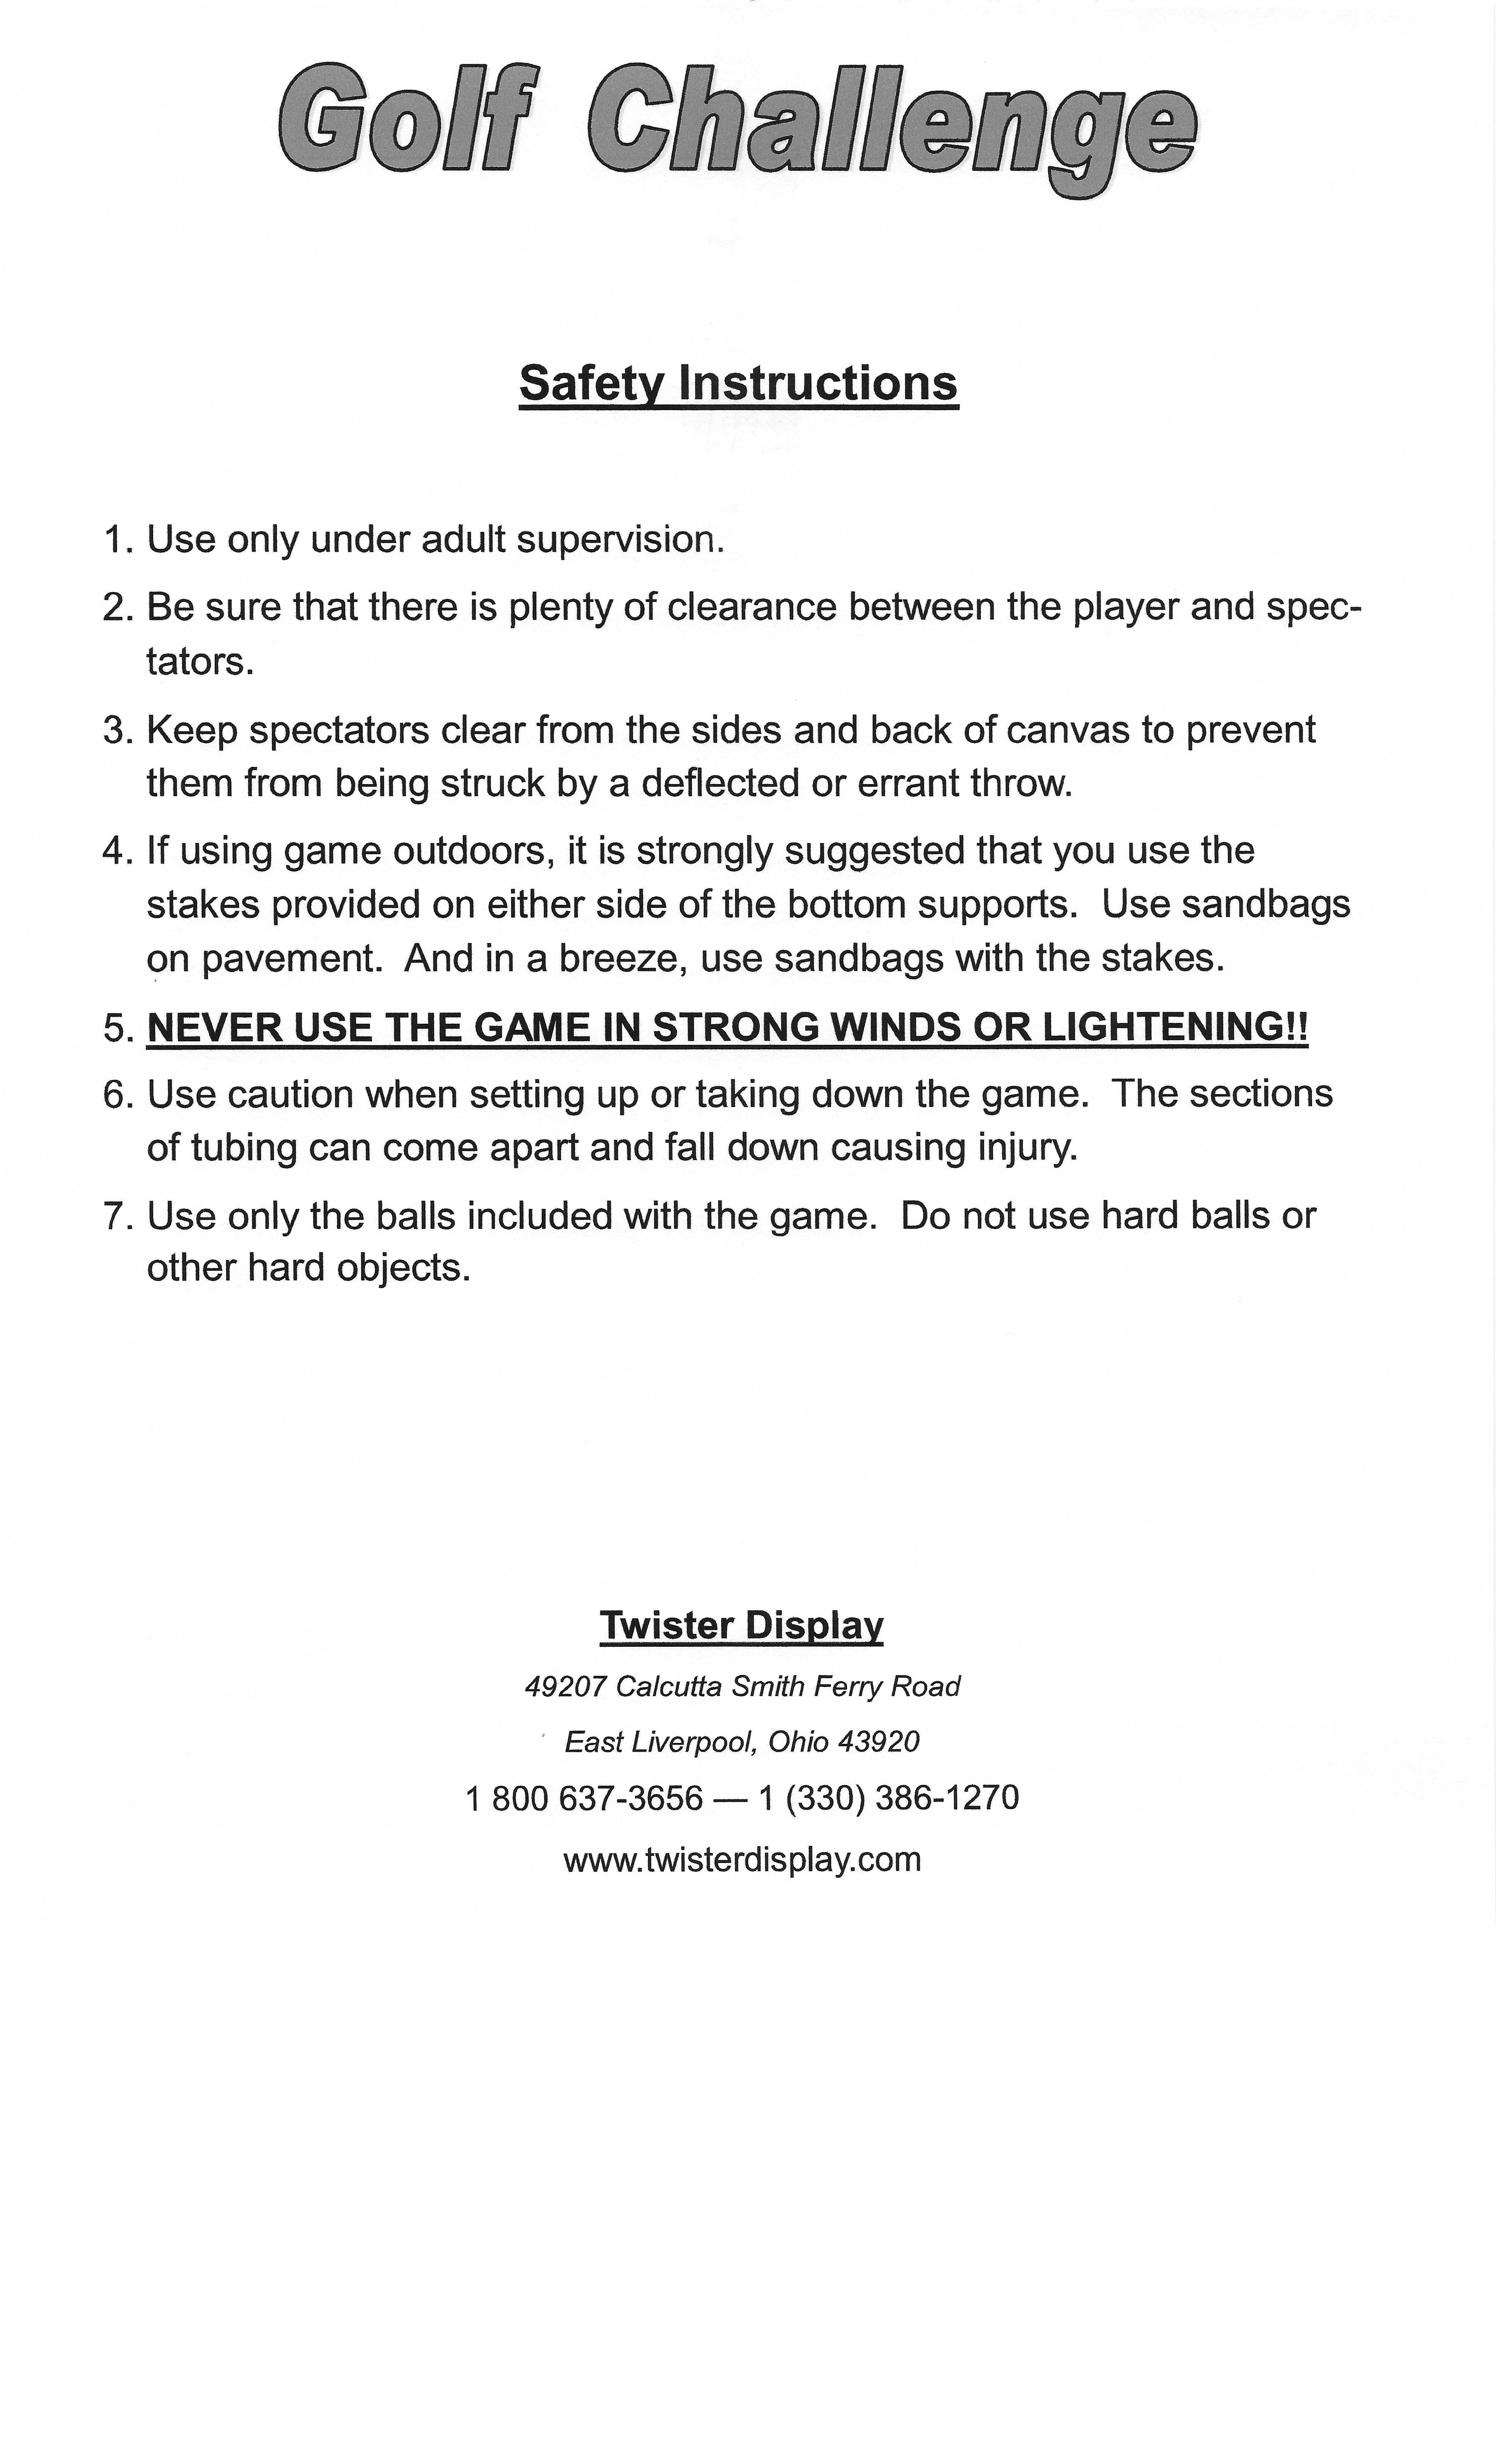 golf-chipping-challenge-instructions0004.jpg